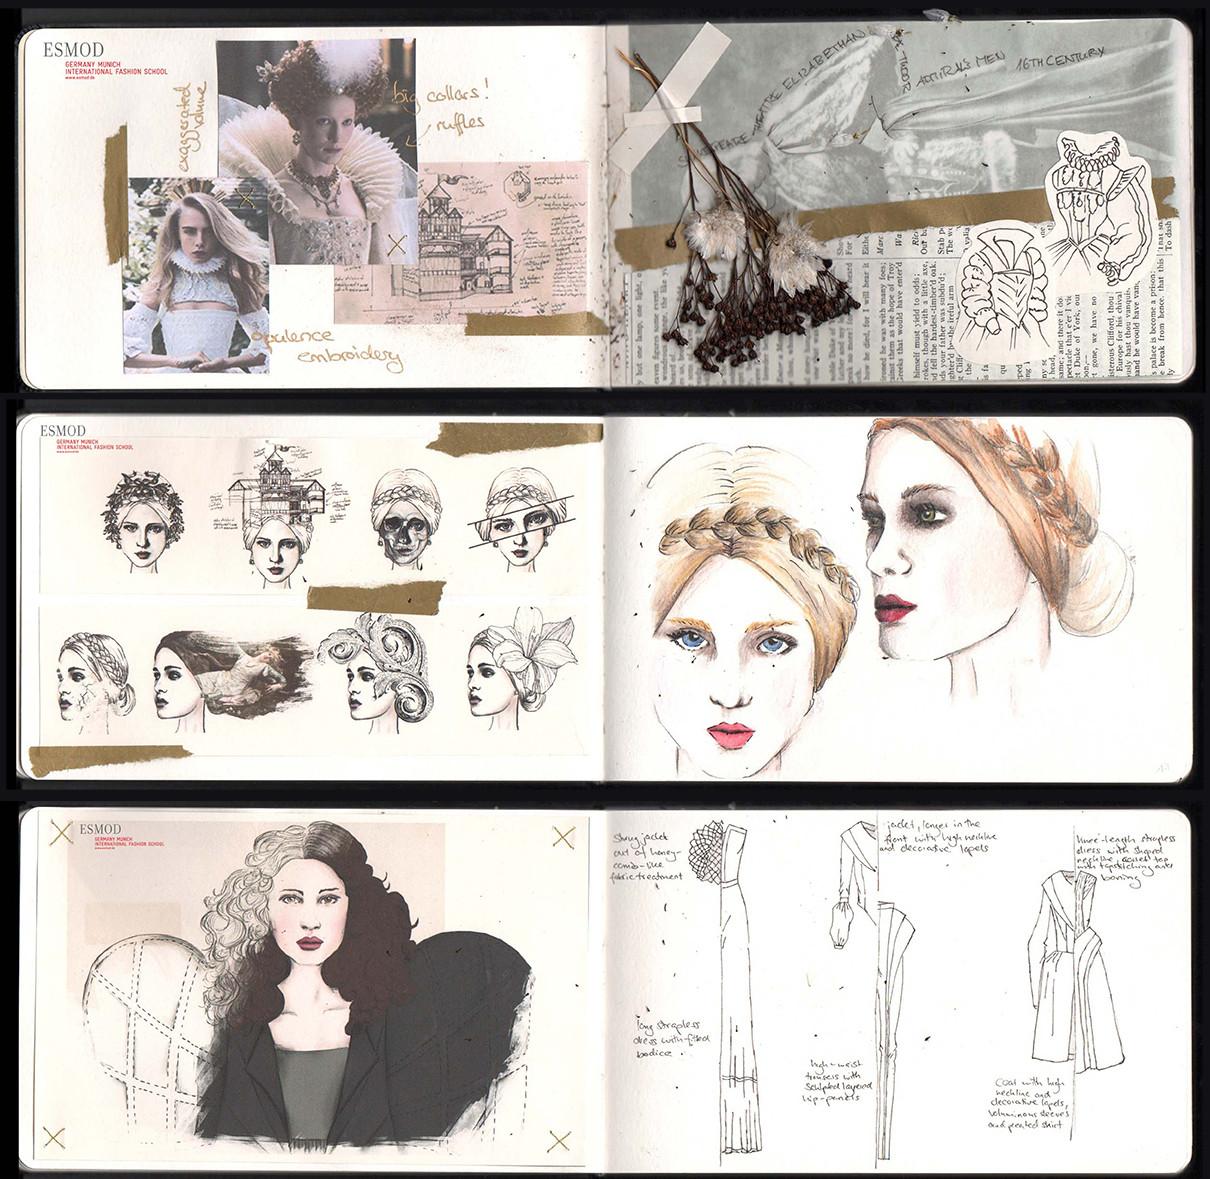 Sarah Silbermann – METHOD IN MADNESS – ESMOD Munich